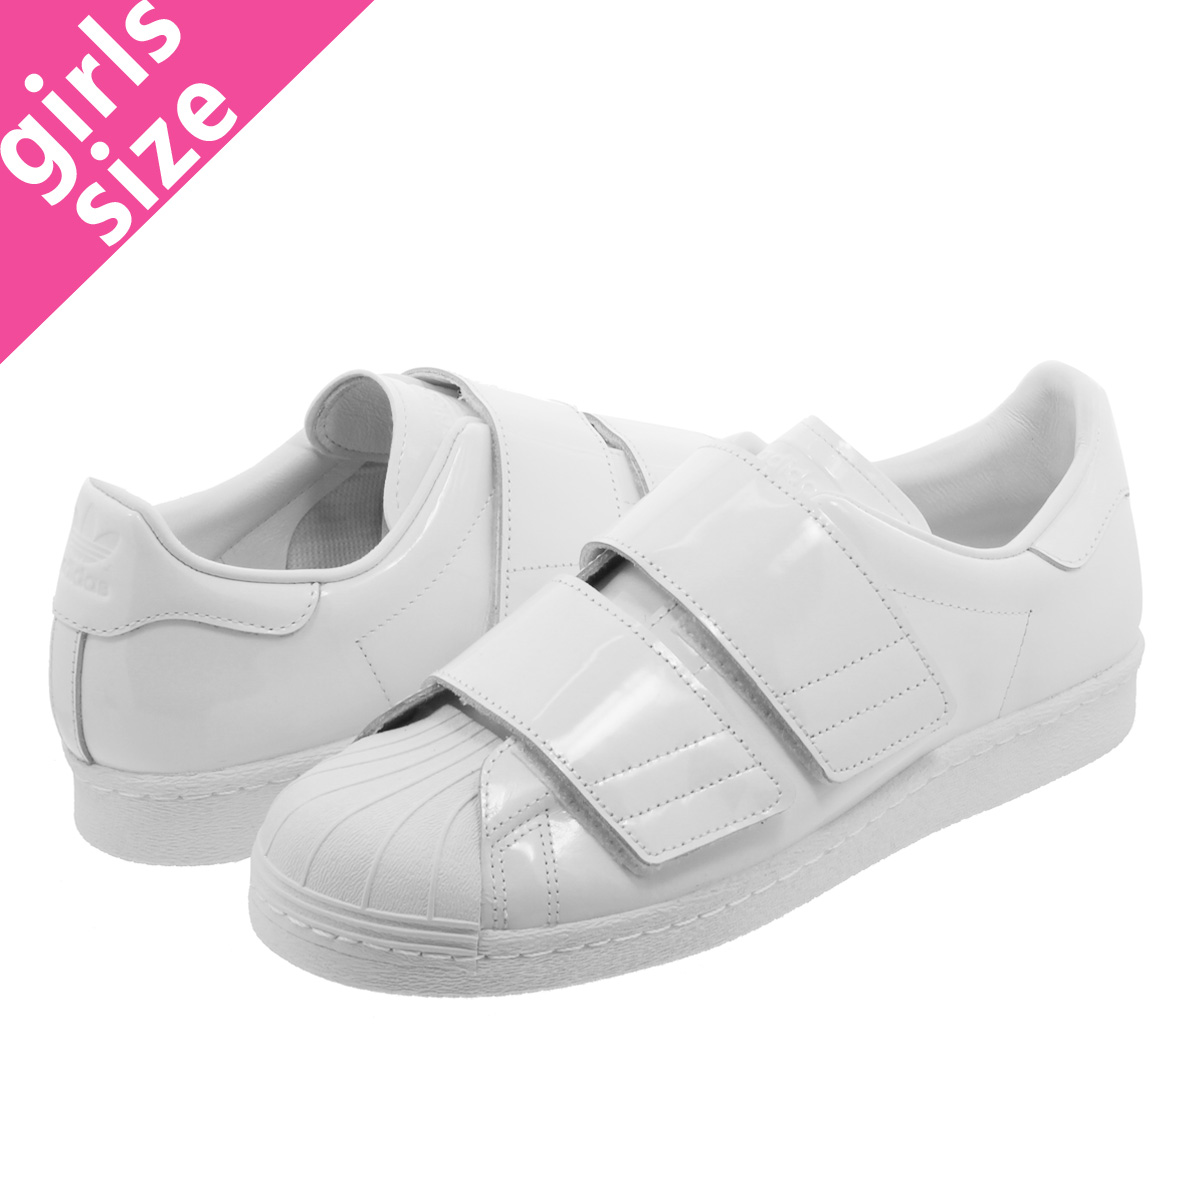 finest selection 12dd2 5061a adidas SUPERSTAR 80s CF W Adidas superstar 80s CF W RUNNING WHITE/RUNNING  WHITE/RUNNING WHITE b28045